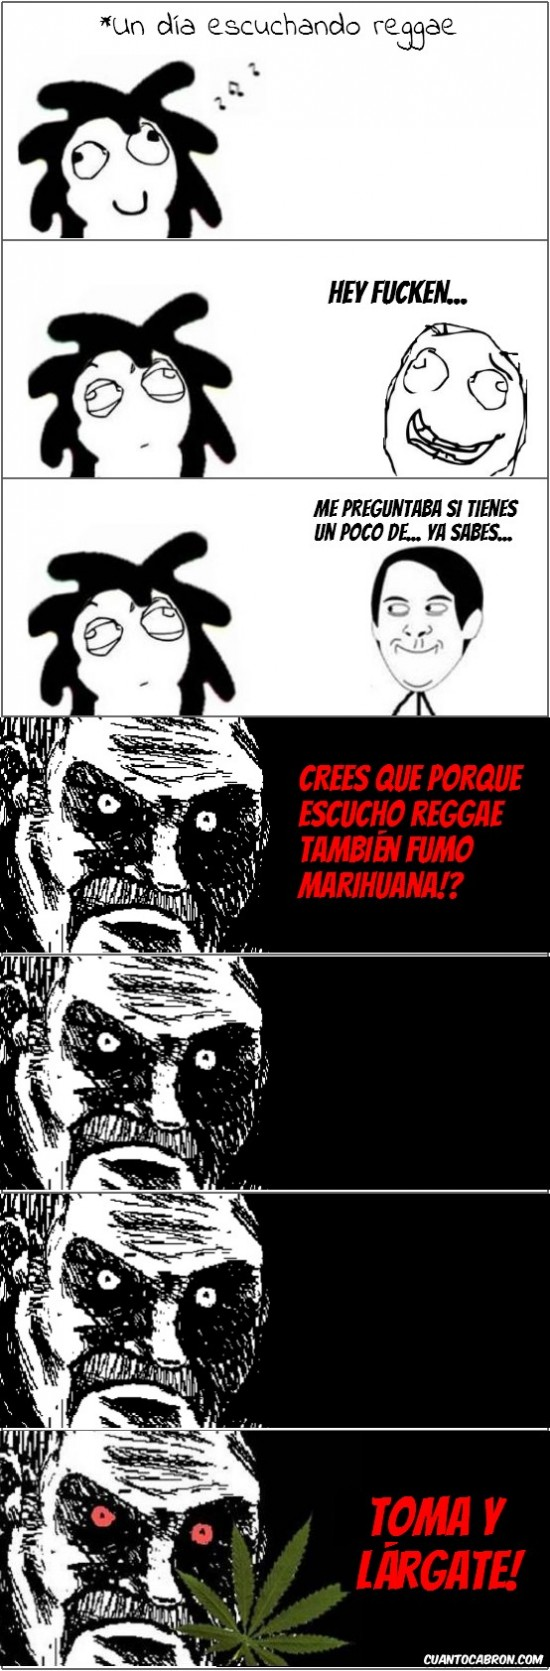 amigo,fuckencio,marihuana,mirada fija,música,rasta,reggae